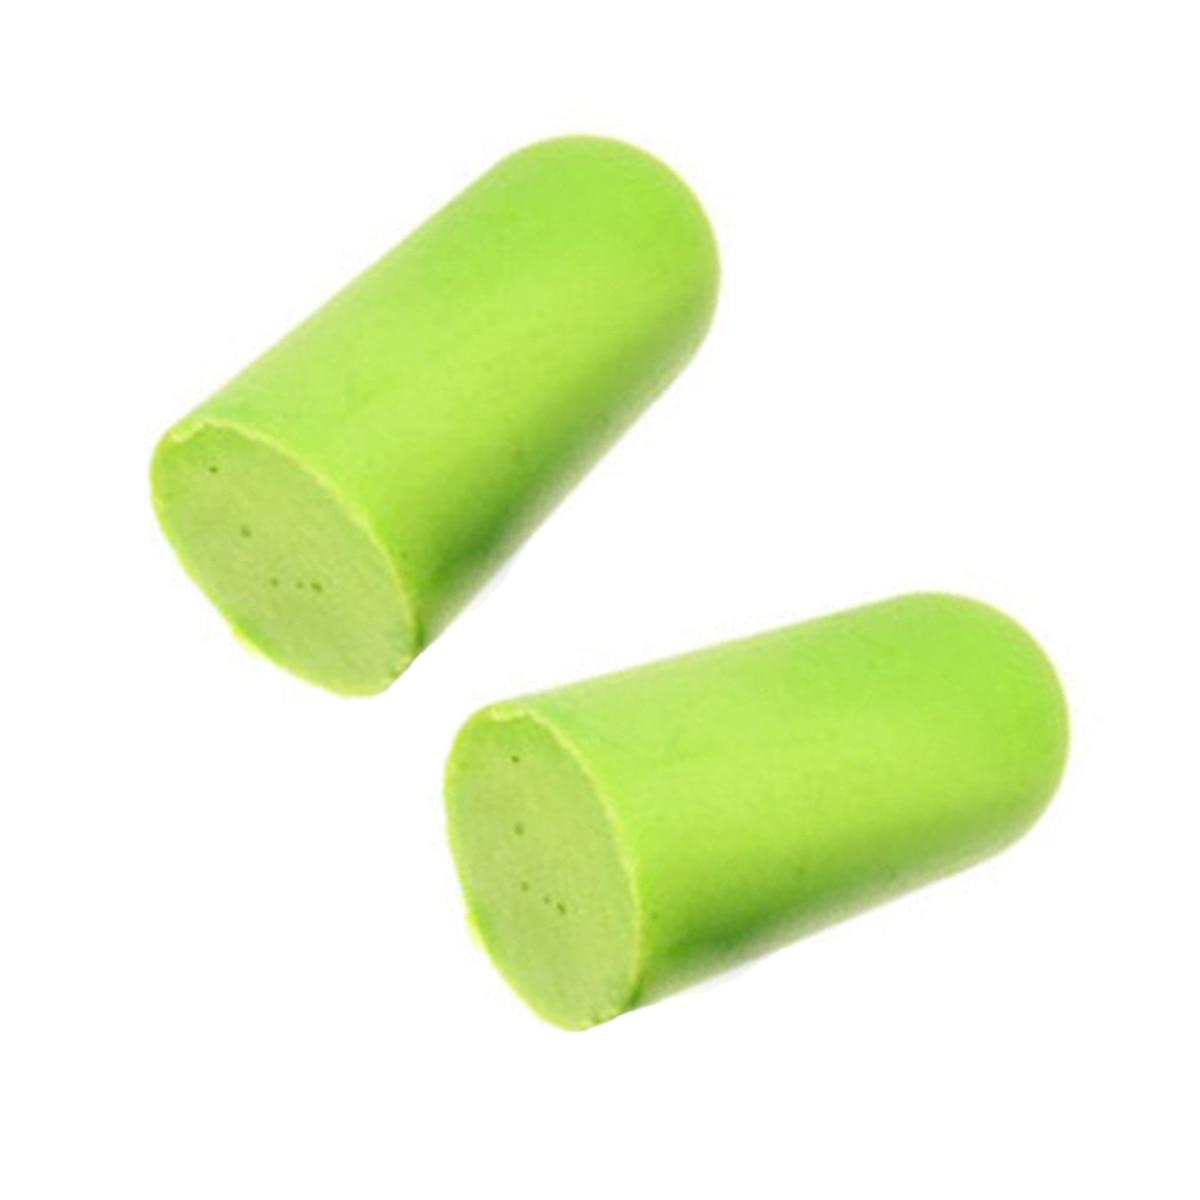 30 pairs soft foam earplugs for Anti noise sleep on car plane travel